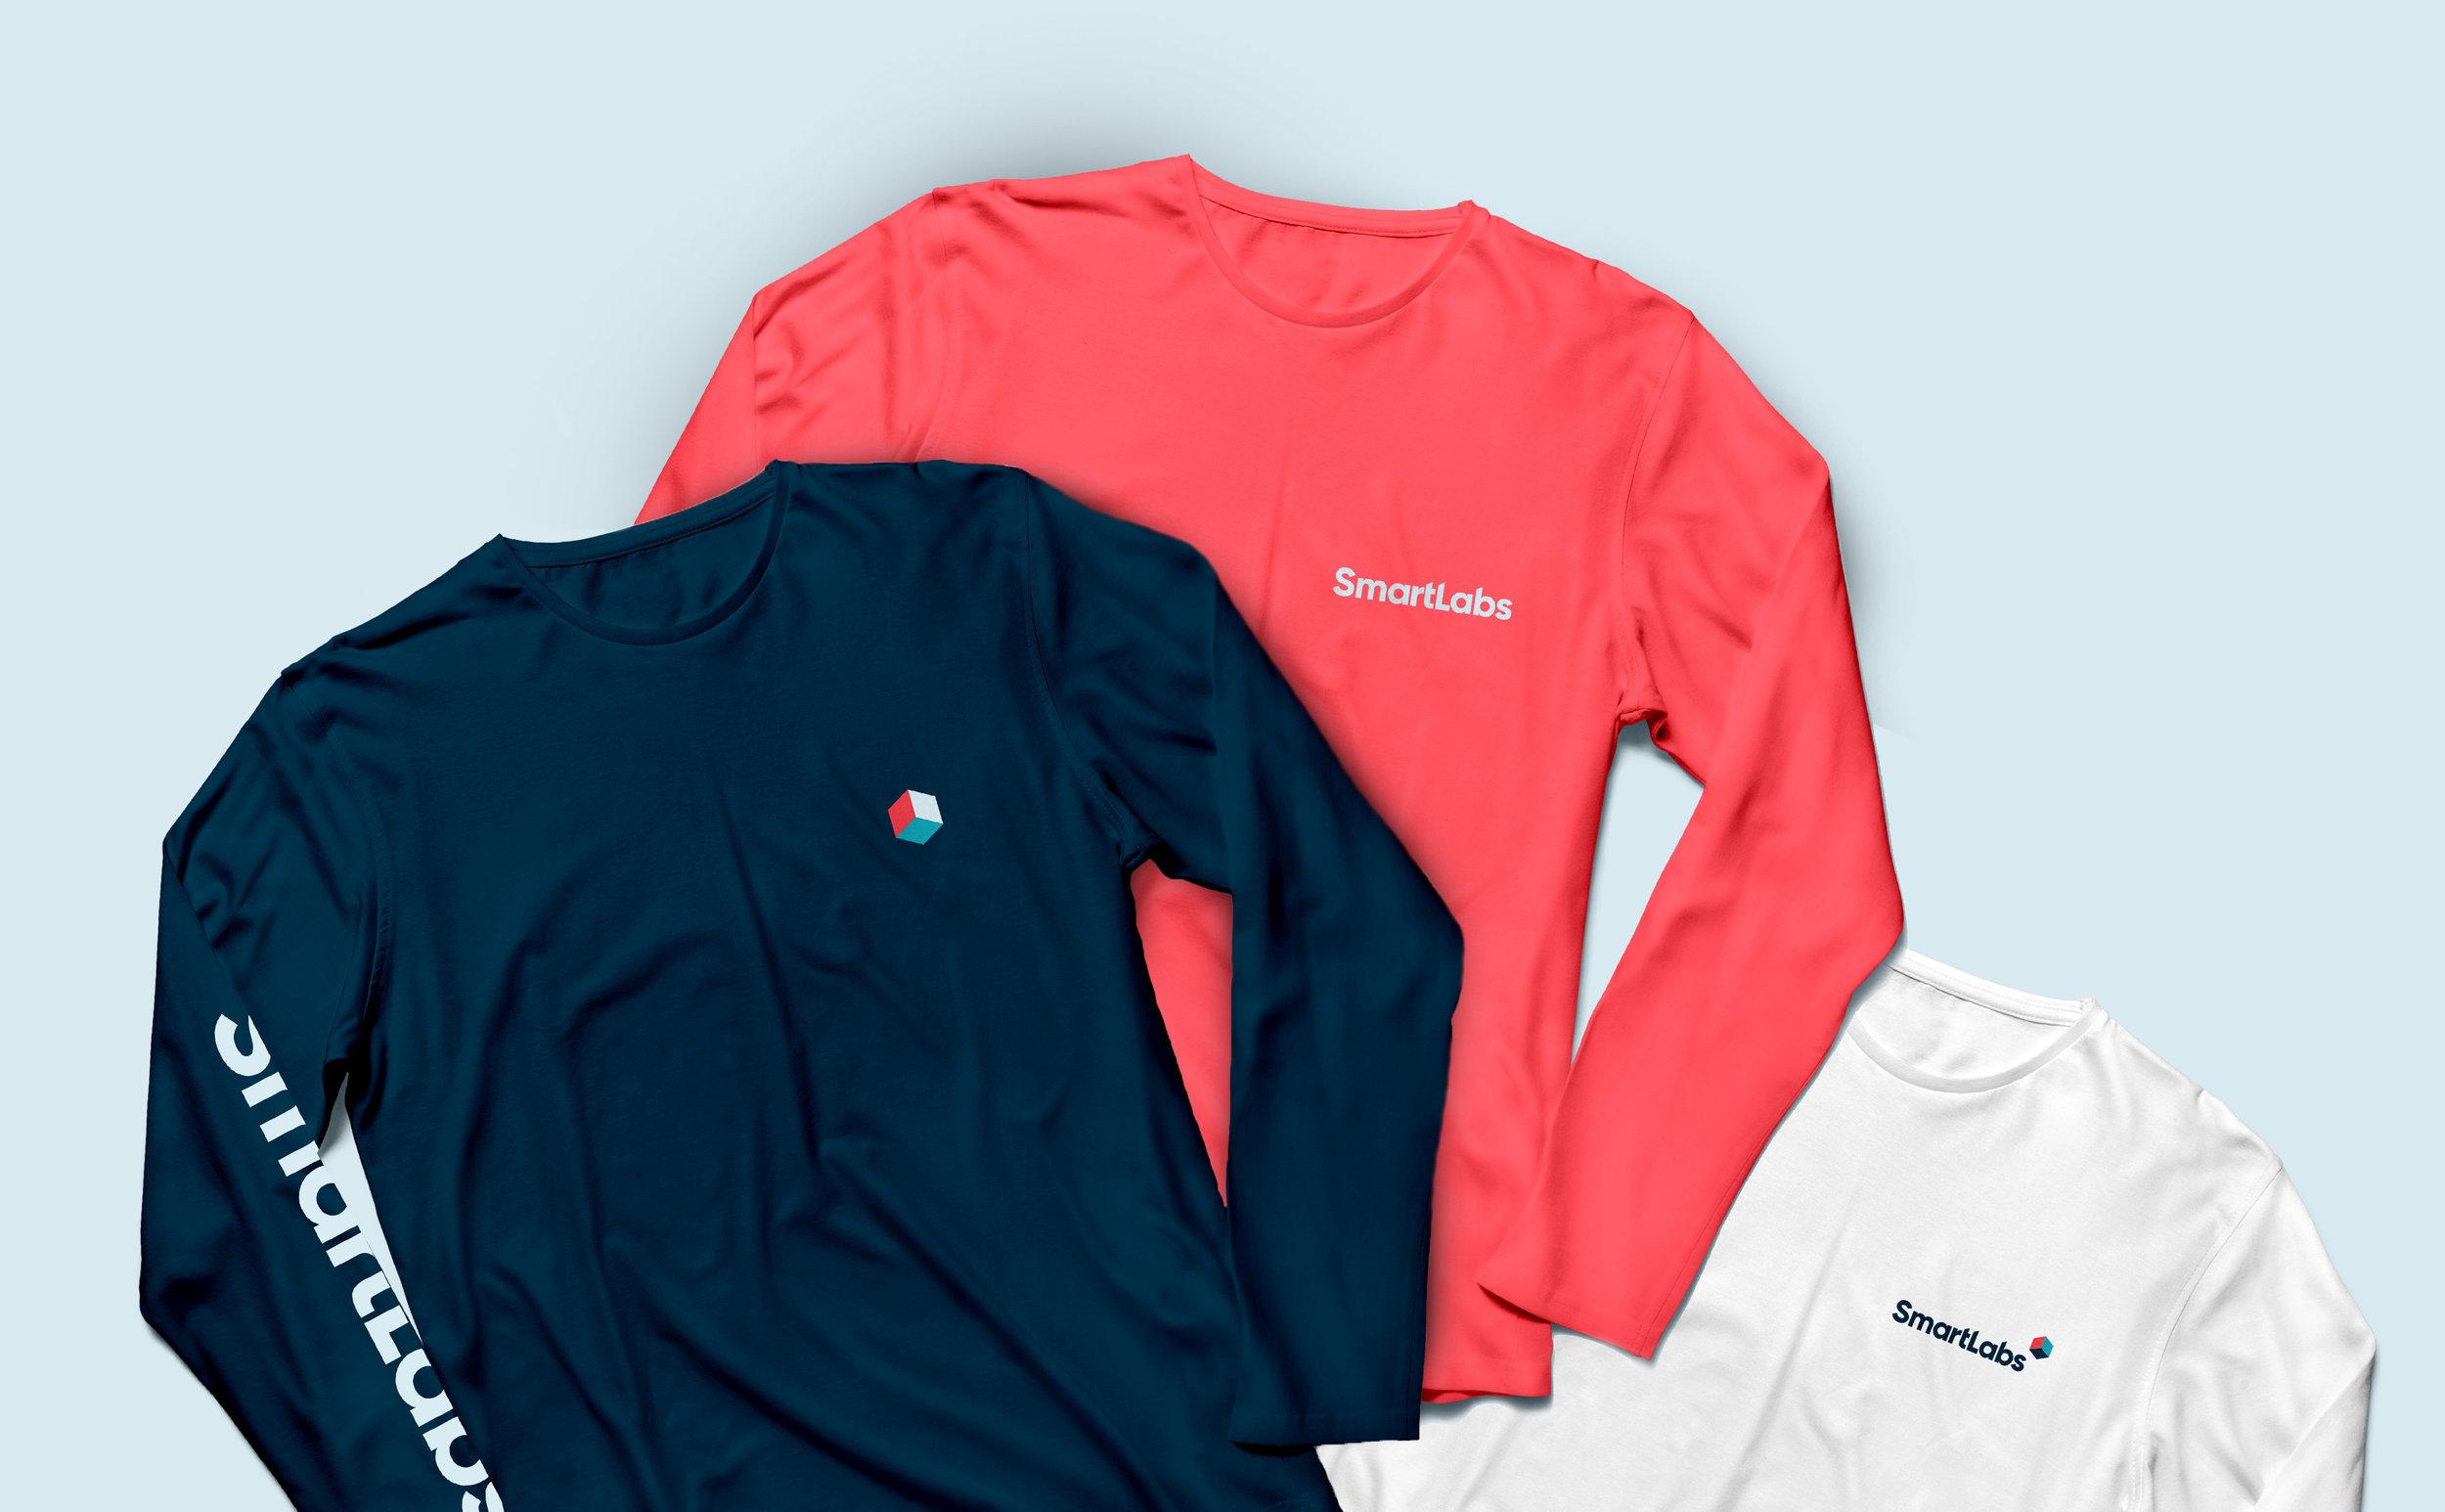 Fair_Folk_SmartLabs_Shirts.jpg